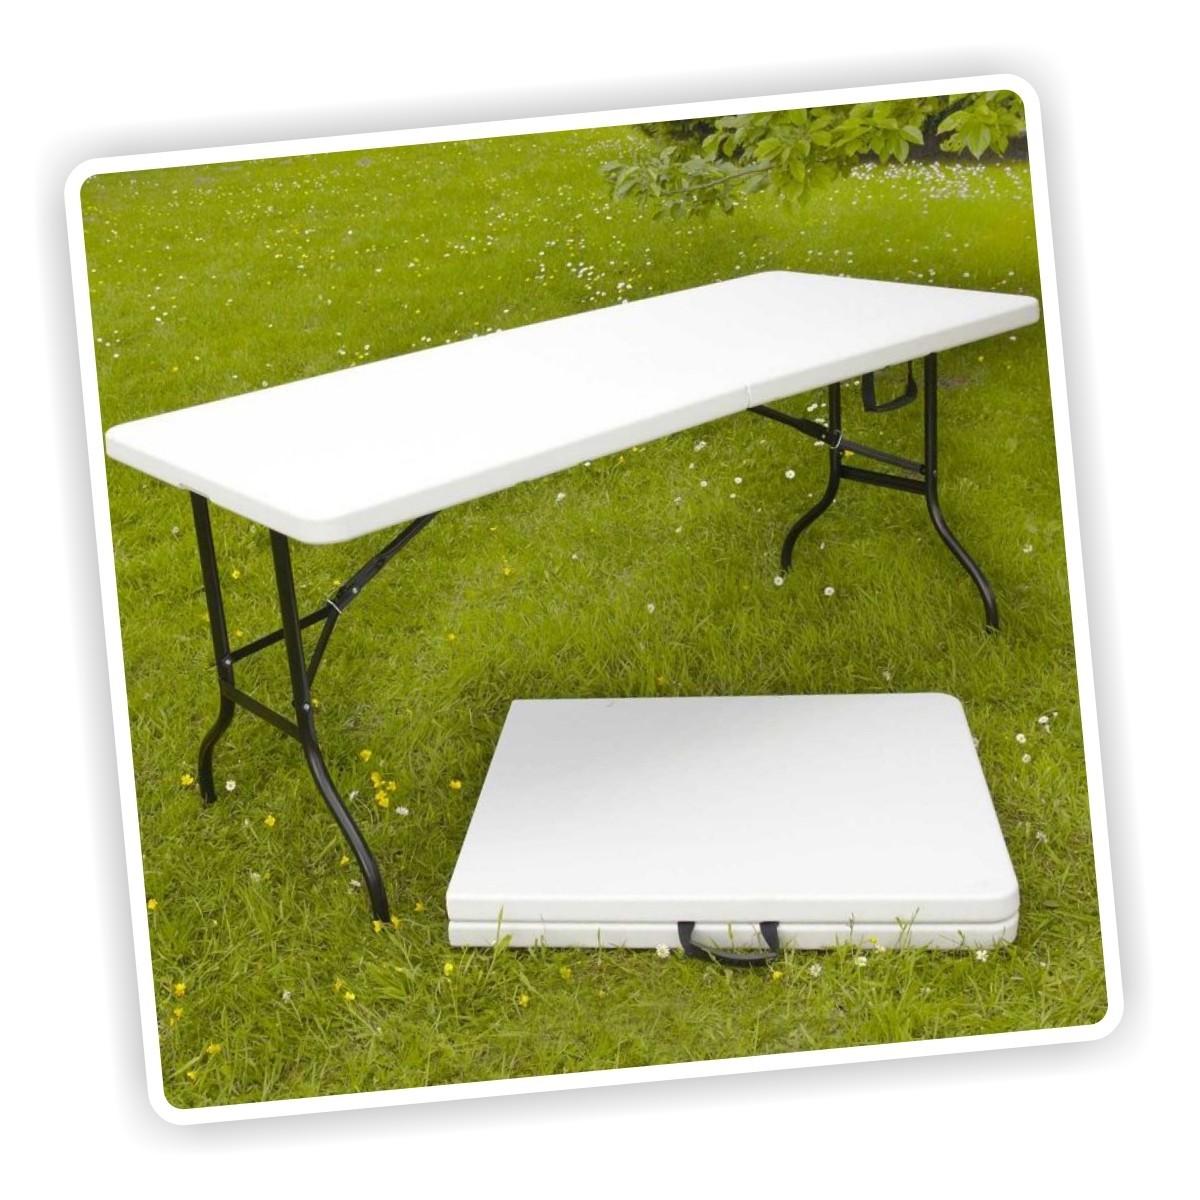 Mesa plegable tipo maleta de 1 8 mts portatil ideal para for Mesa plegable maleta